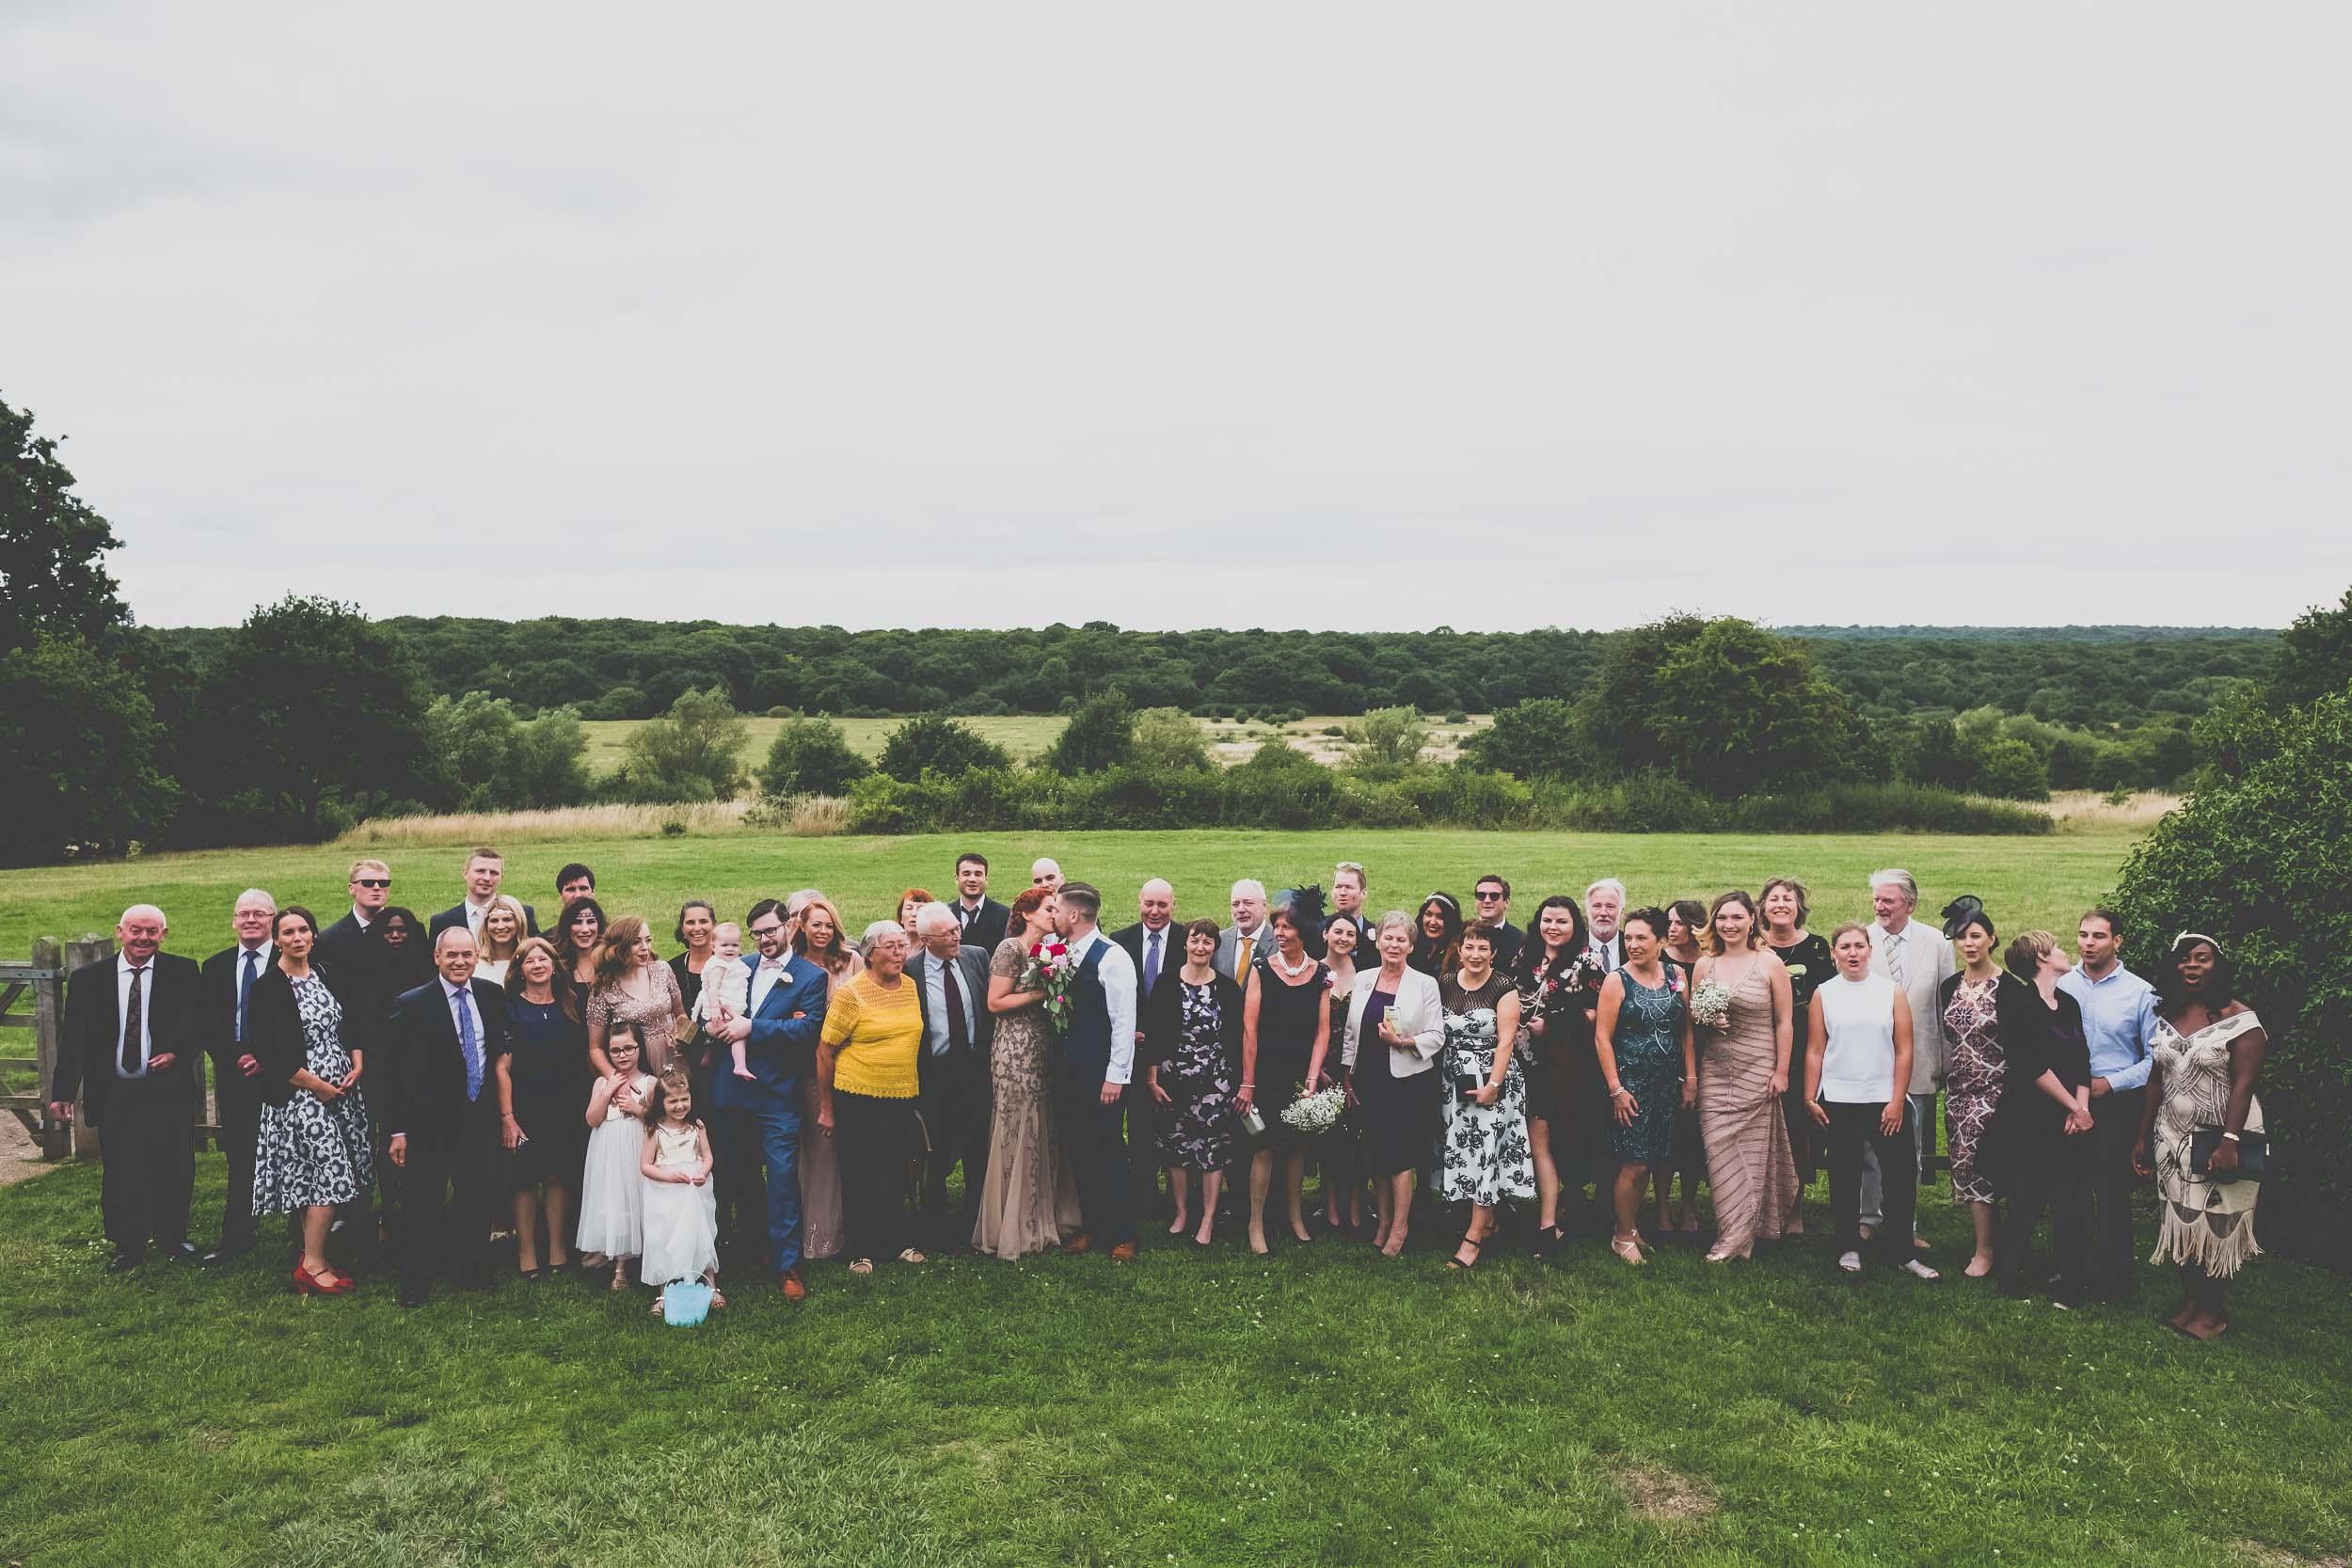 queen-elizabeths-hunting-lodge-epping-forest-wedding235.jpg